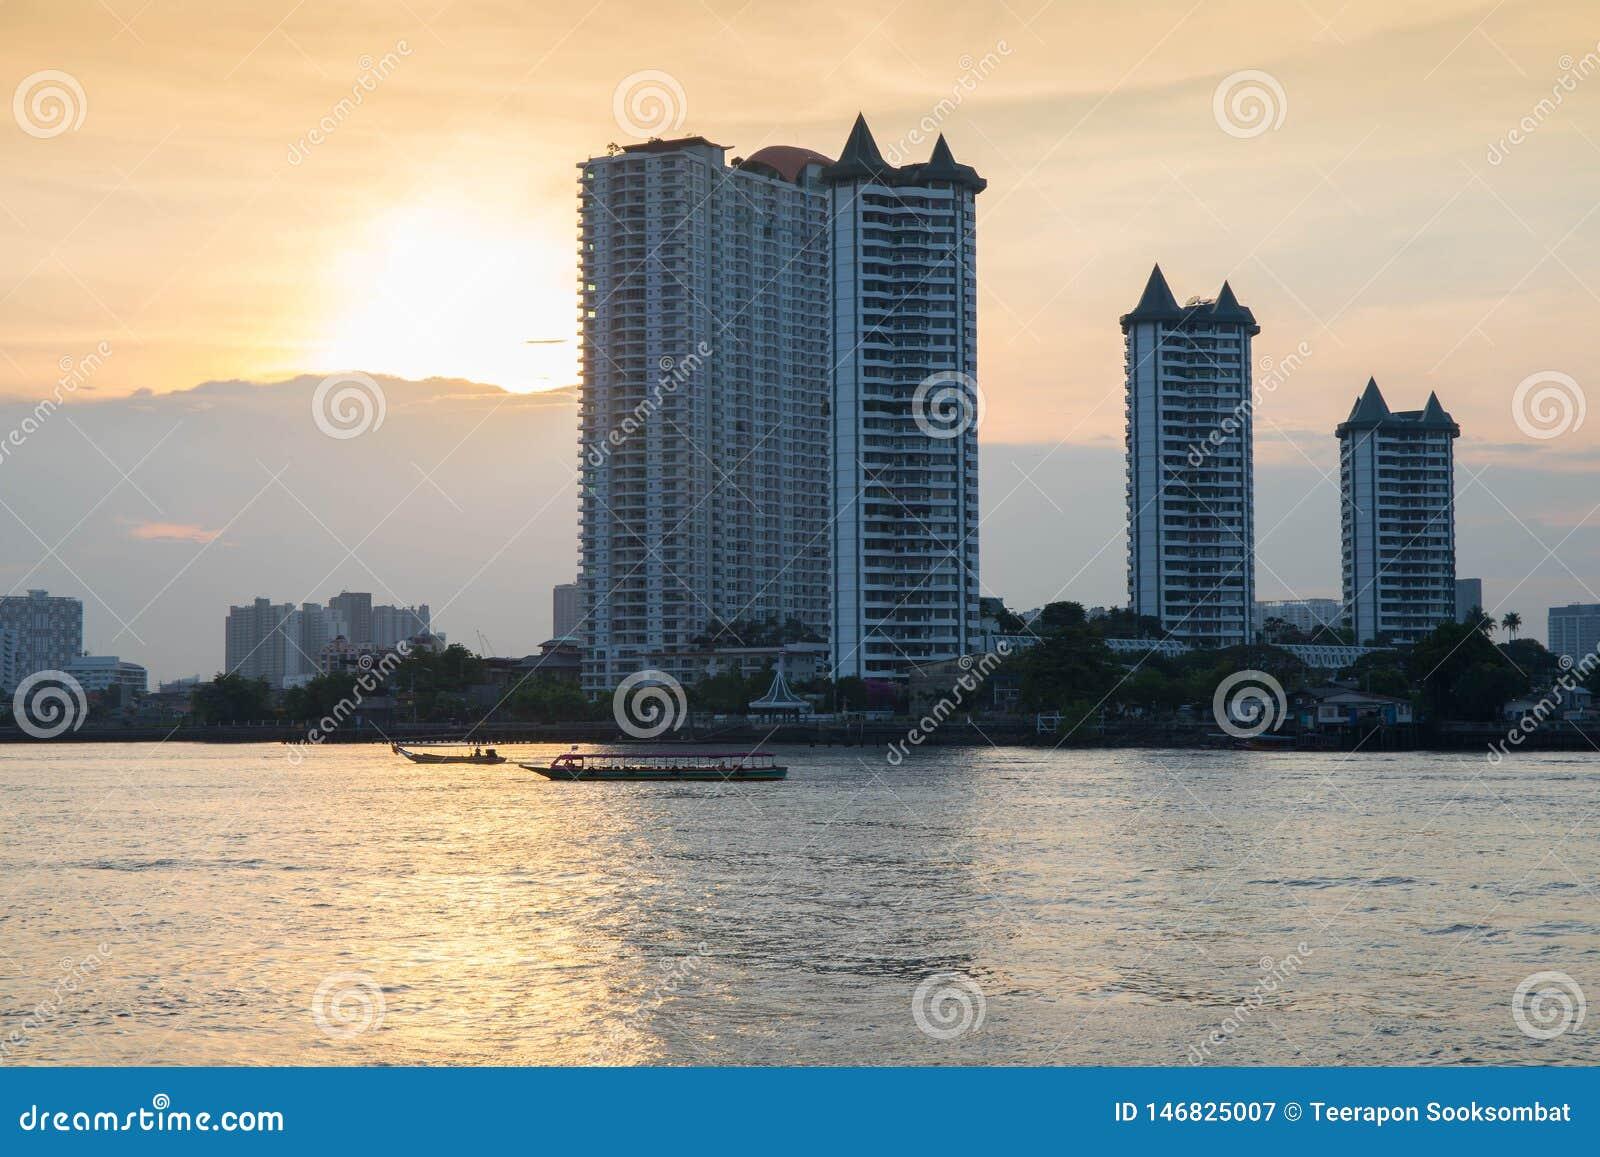 Modern buildings condominium at Chao Phraya River Bangkok Thailand at sunrise